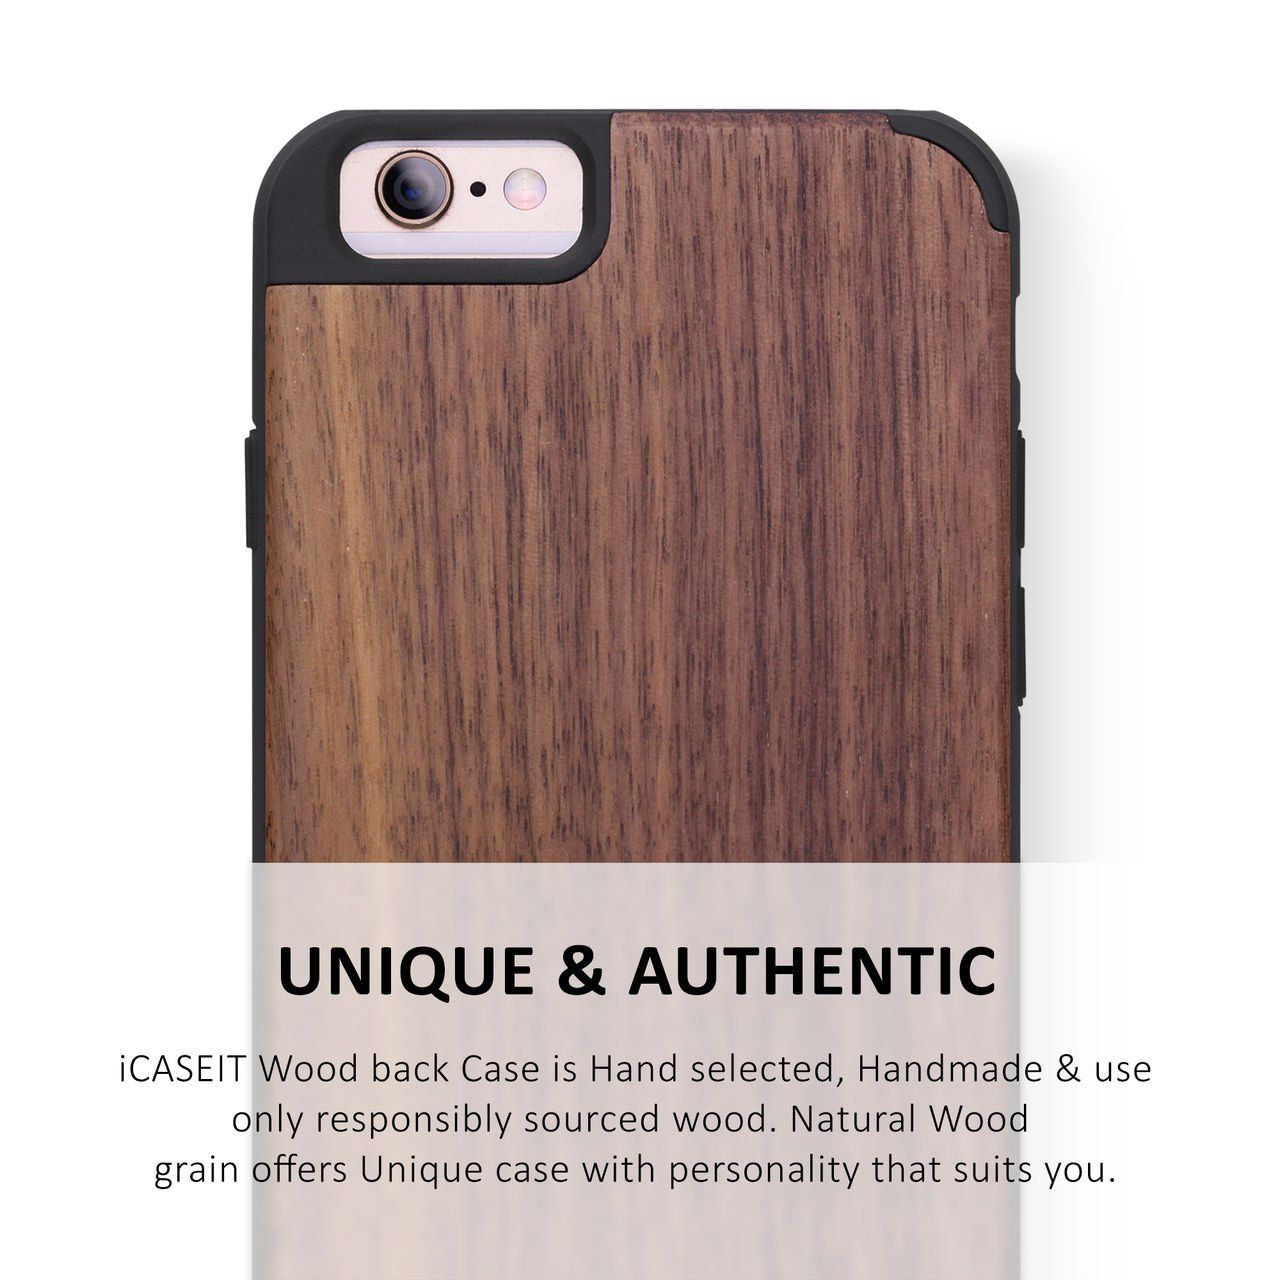 iCASEIT iPhone 6 / 6s Wood Case | Walnut / Black